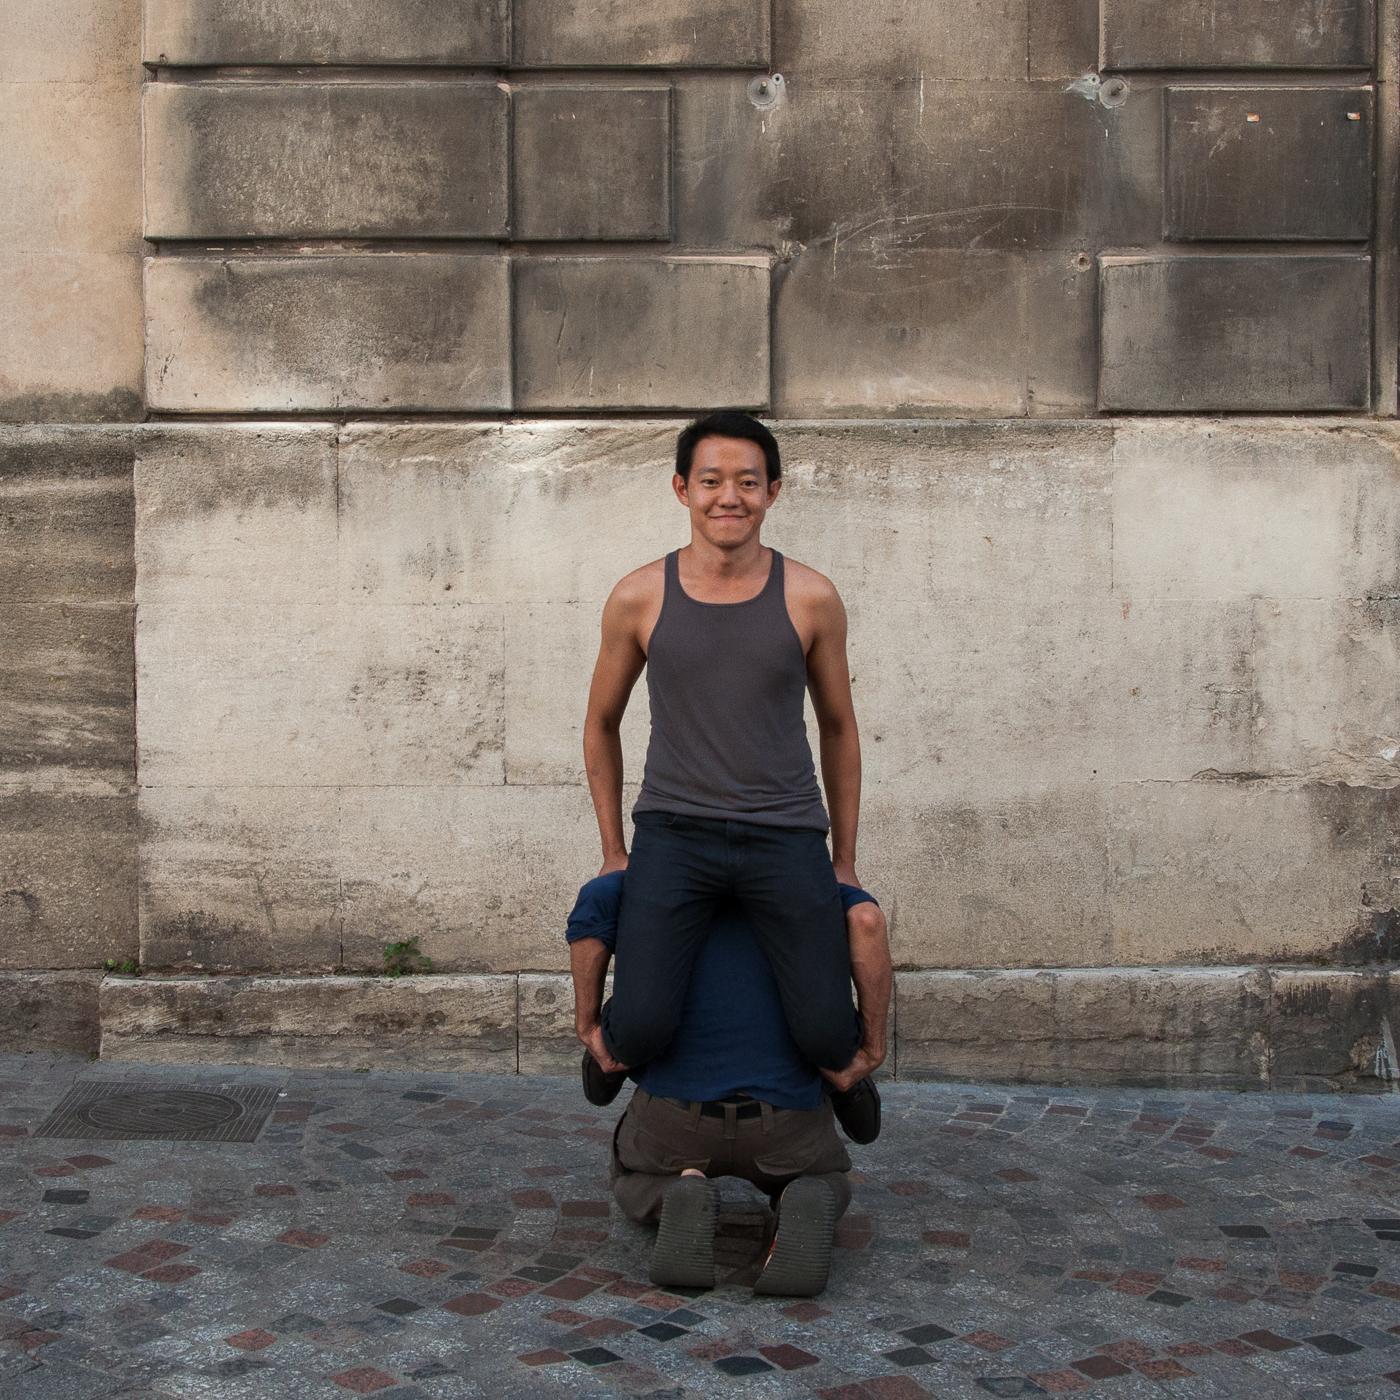 Arles_2015_-_Double_génuflexion